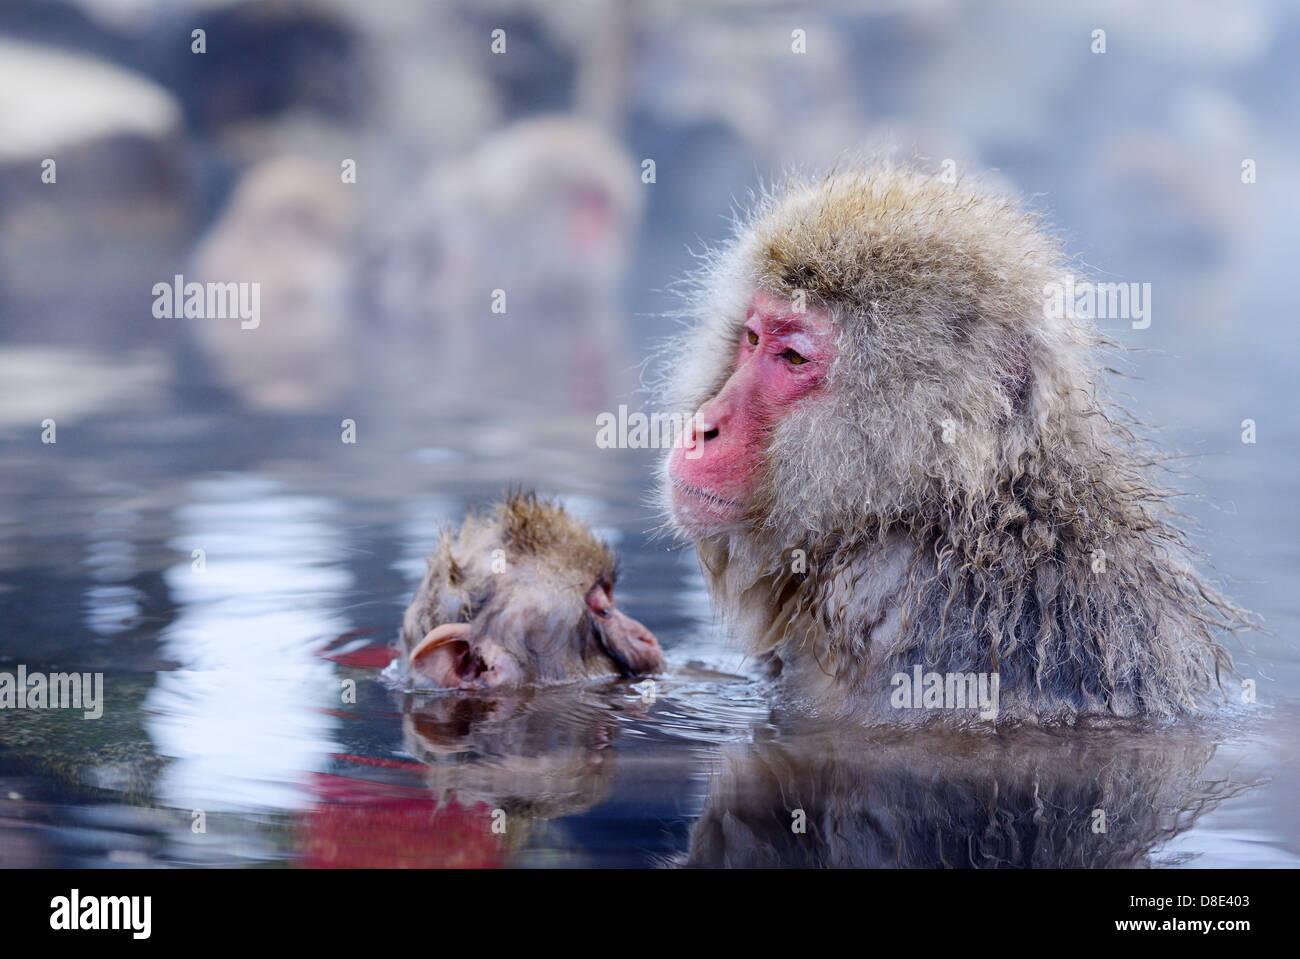 Neve giapponese scimmie (macachi), in Nagano, Giappone. Immagini Stock